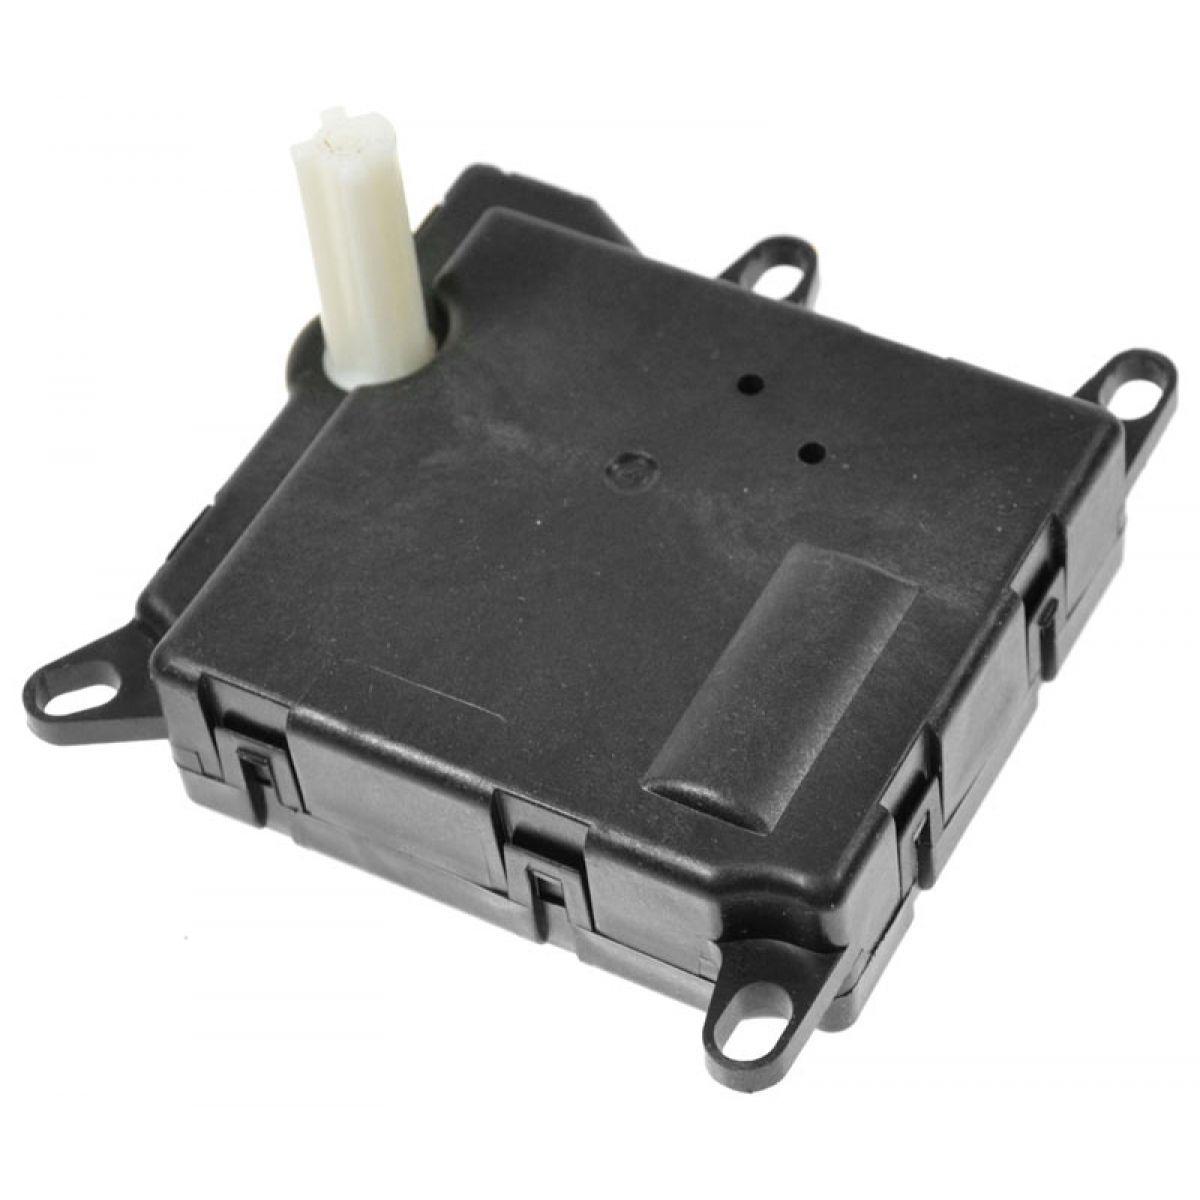 Hvac Heater A C Ac Vent Blend Door Actuator For Ford Taurus Mercury Sable Ebay